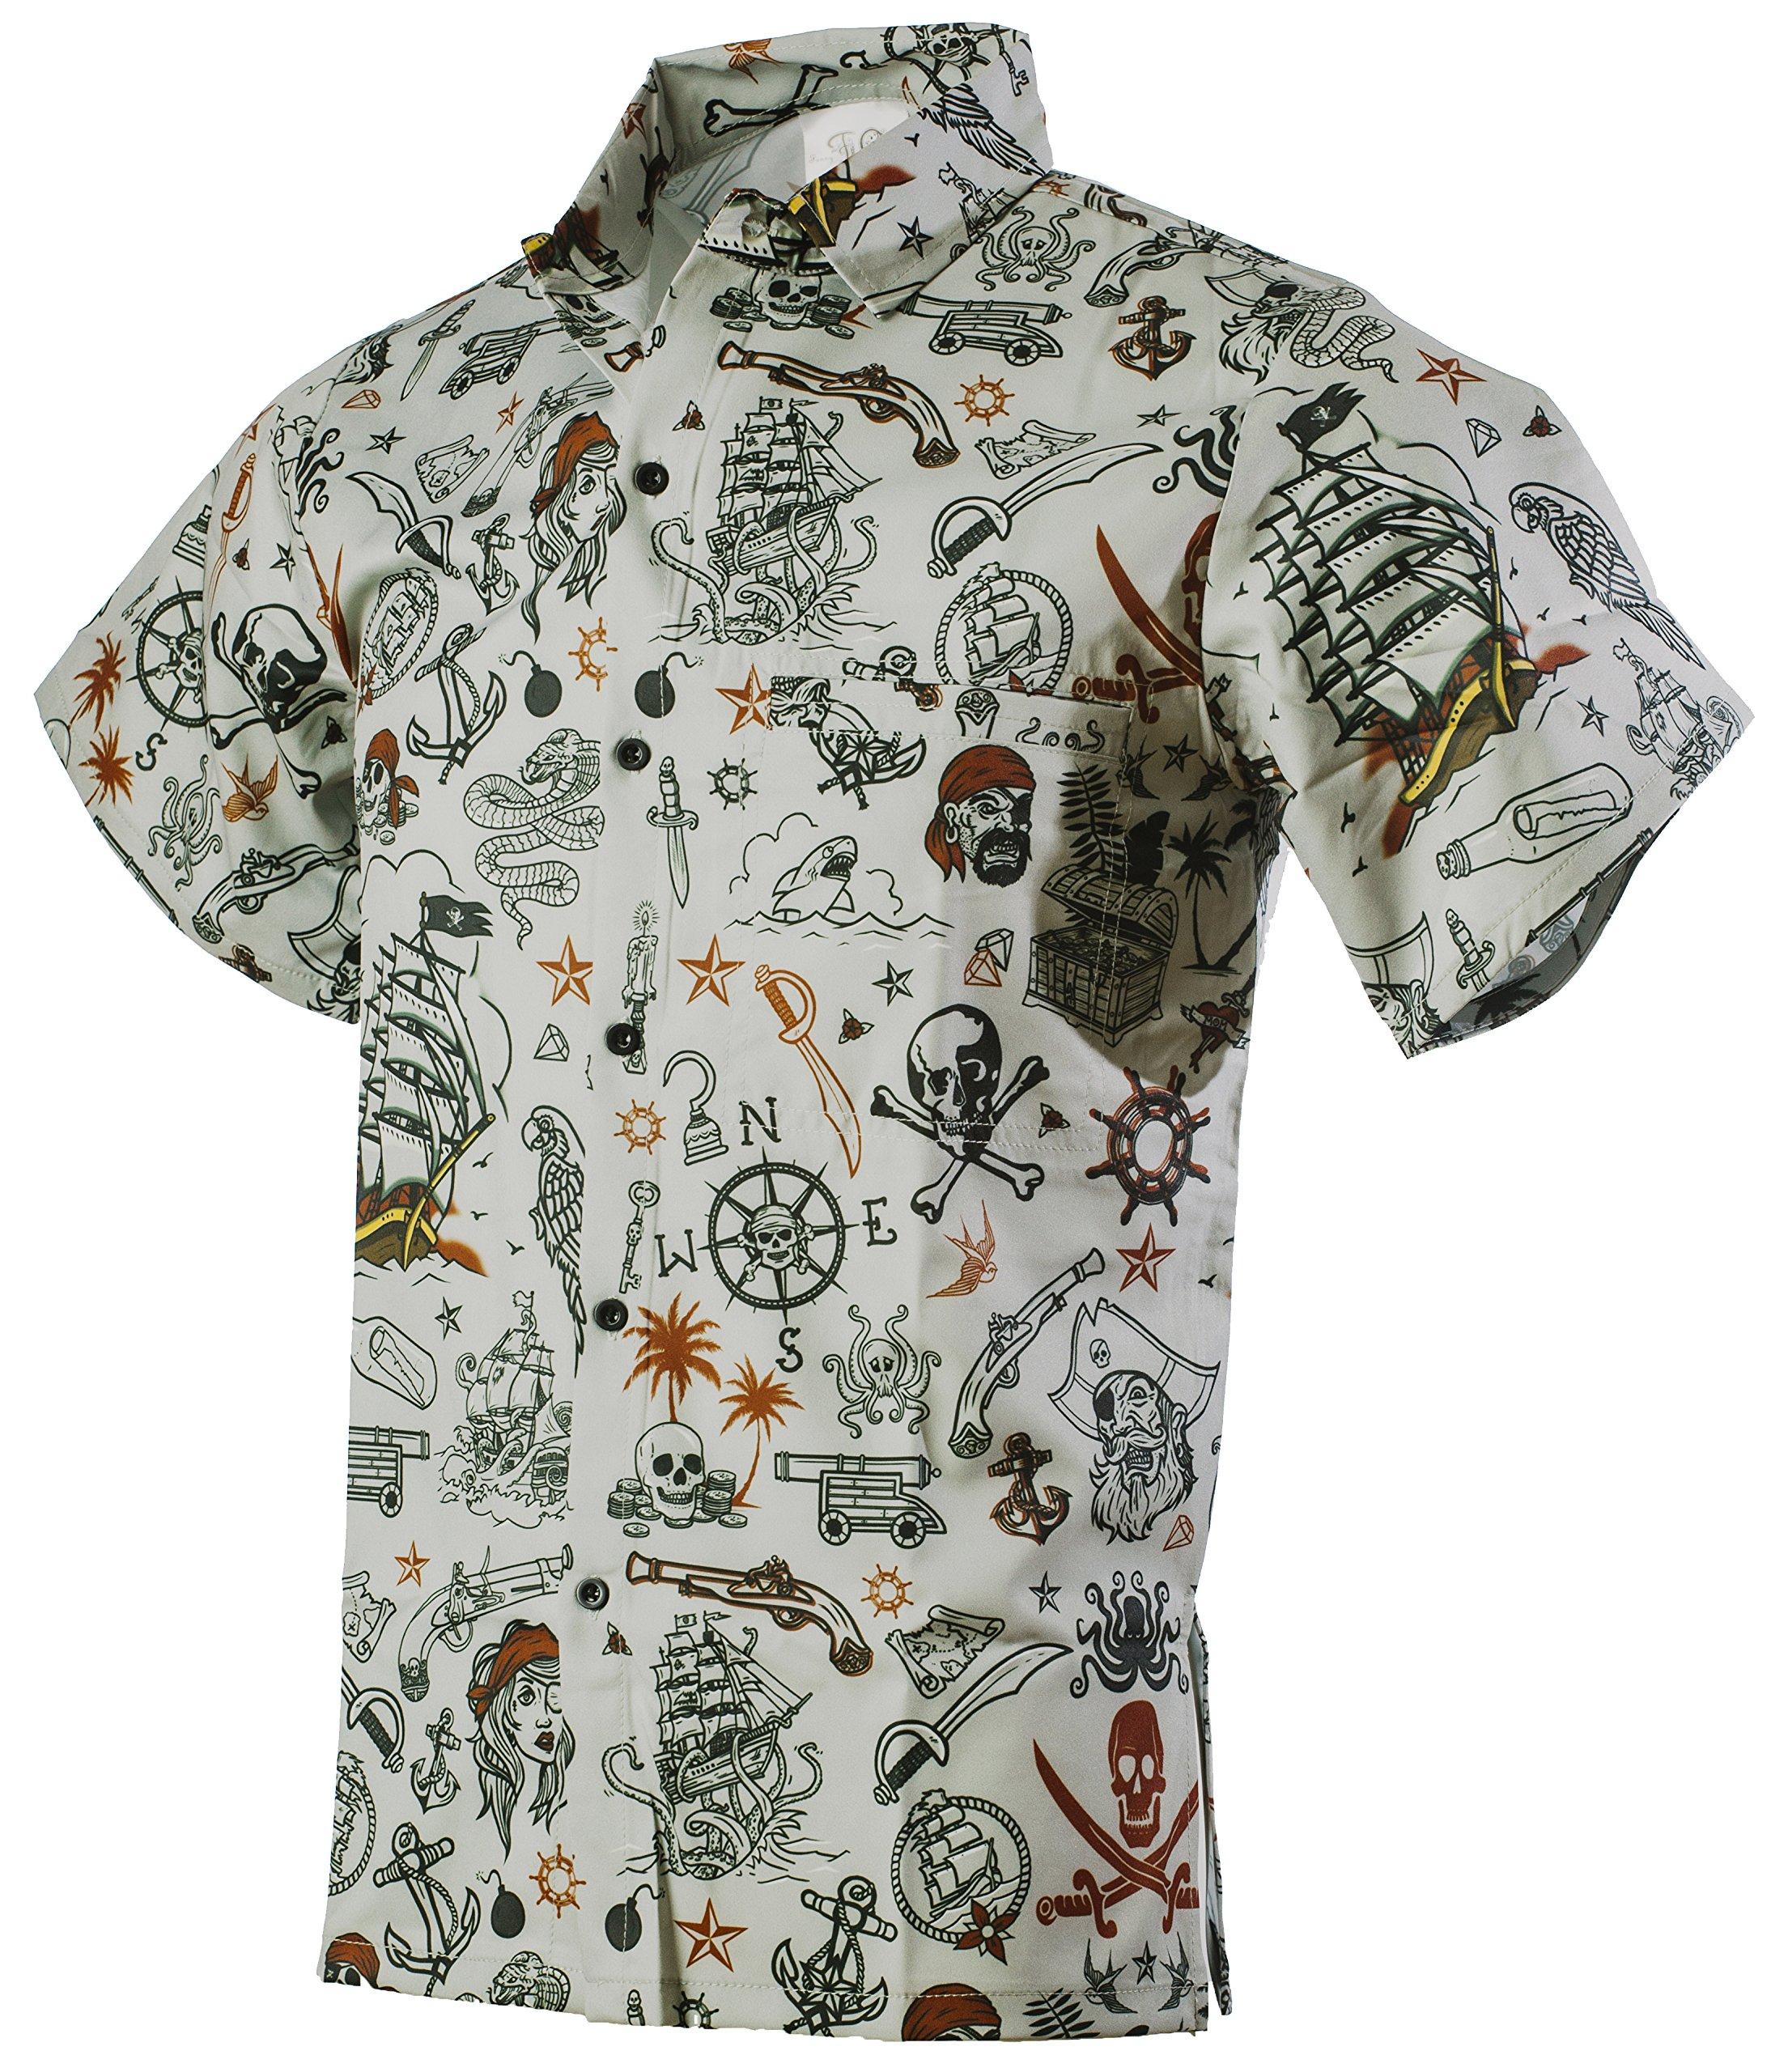 8f55184a Galleon - Funny Guy Mugs Mens Pirate Hawaiian Print Button Down Short  Sleeve Shirt, 2X-Large